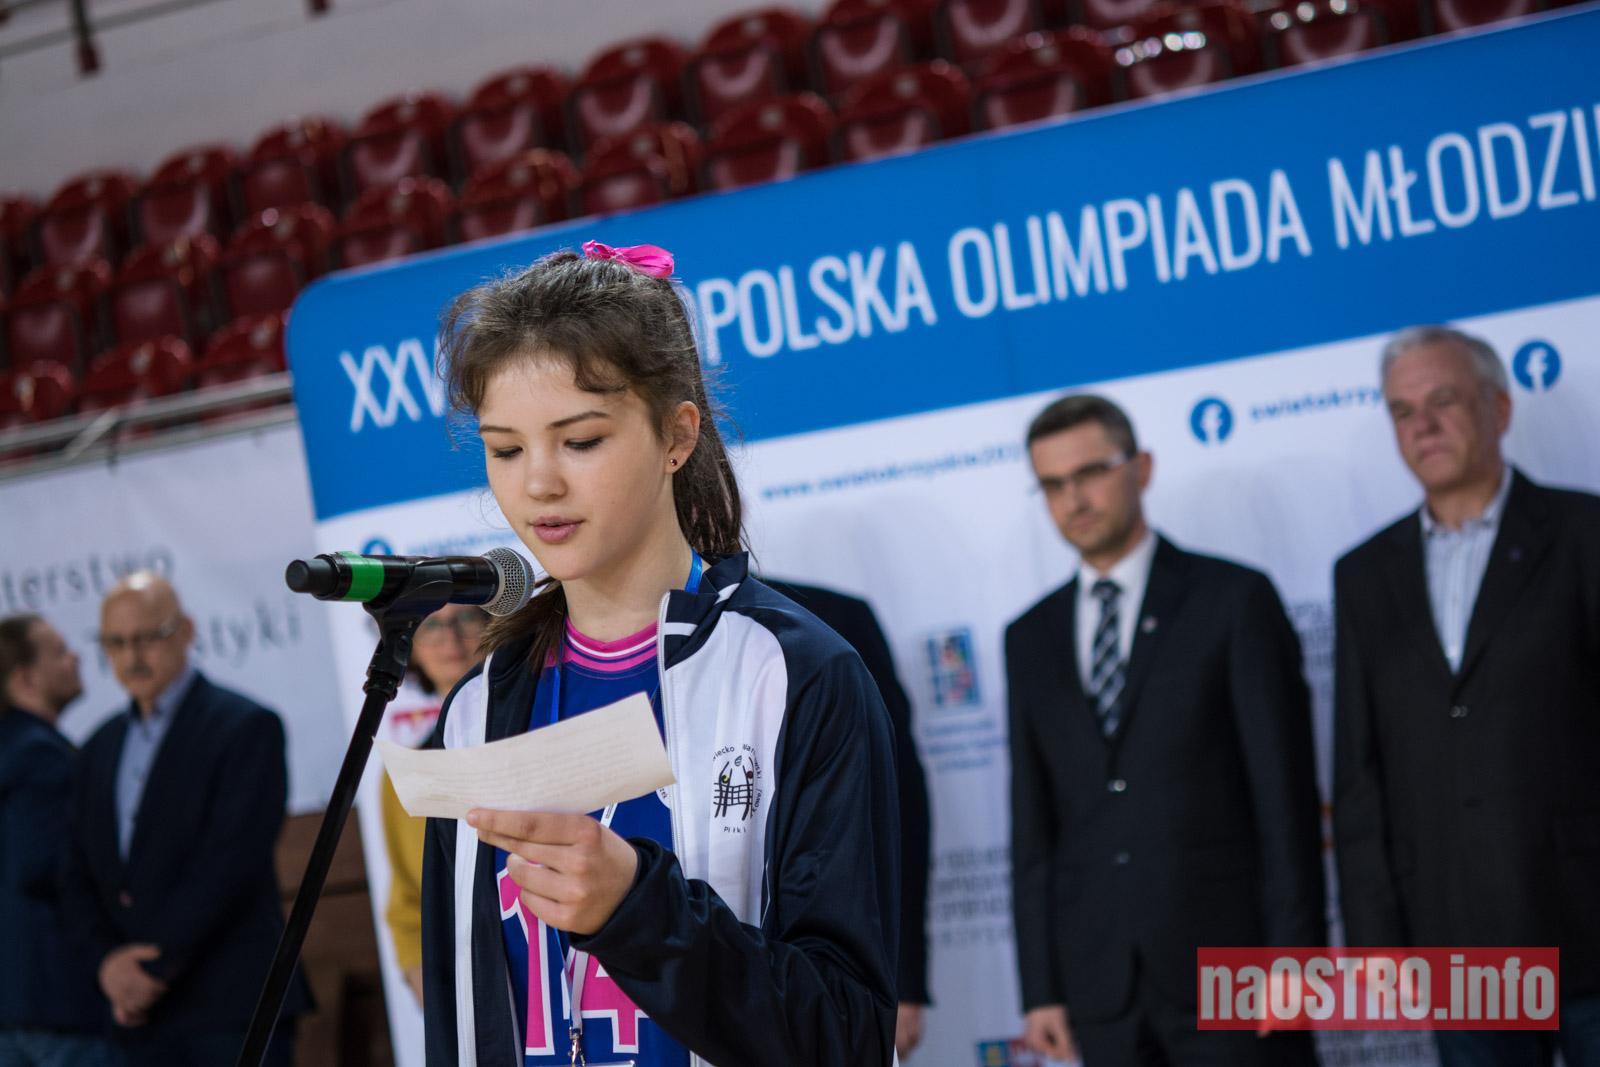 NaOSTRO Olimpiada otwarcie-33